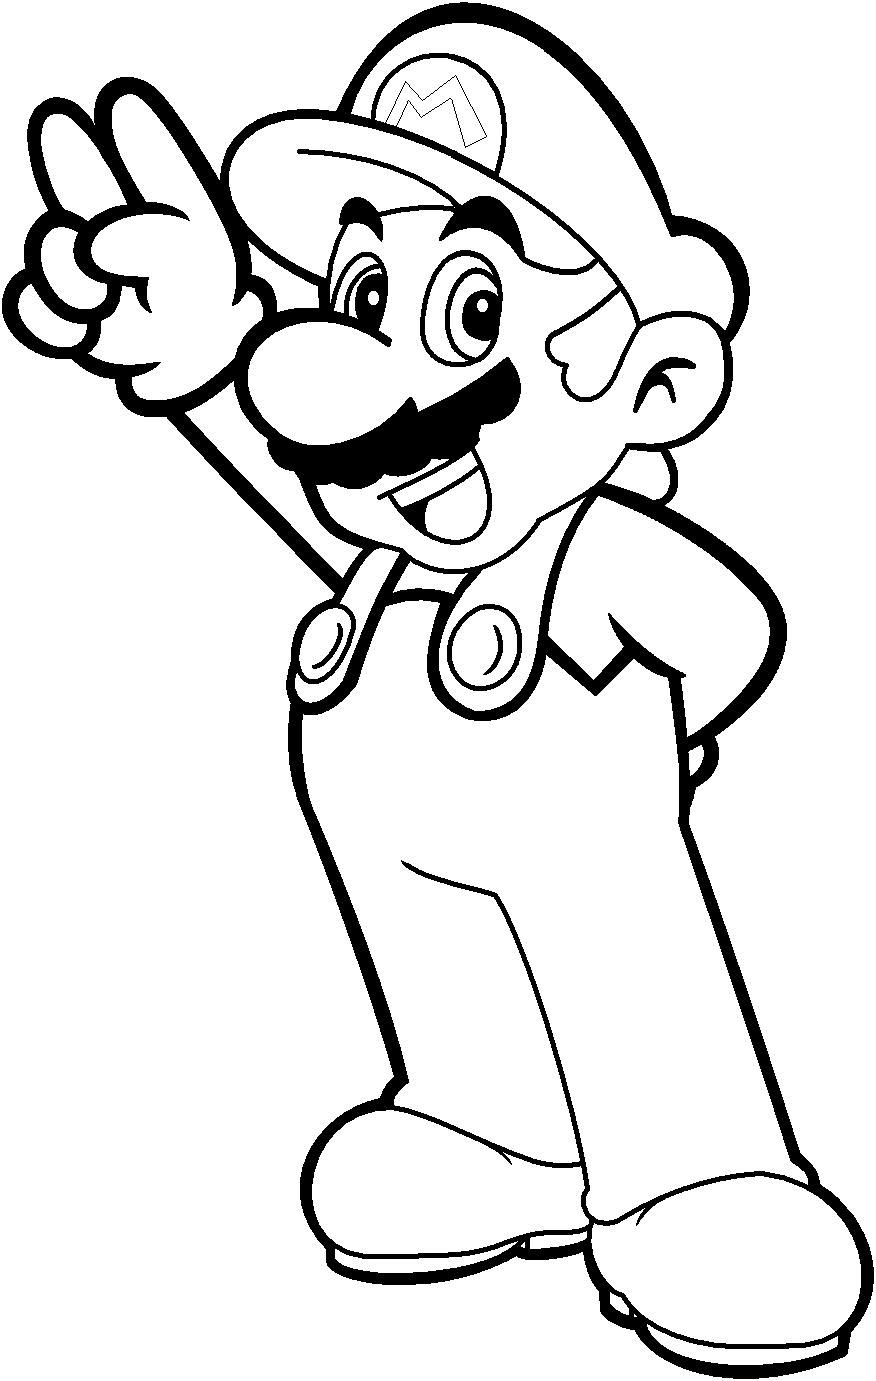 Mario coloring by blistinaorgin on deviantart for Mario and luigi and yoshi coloring pages